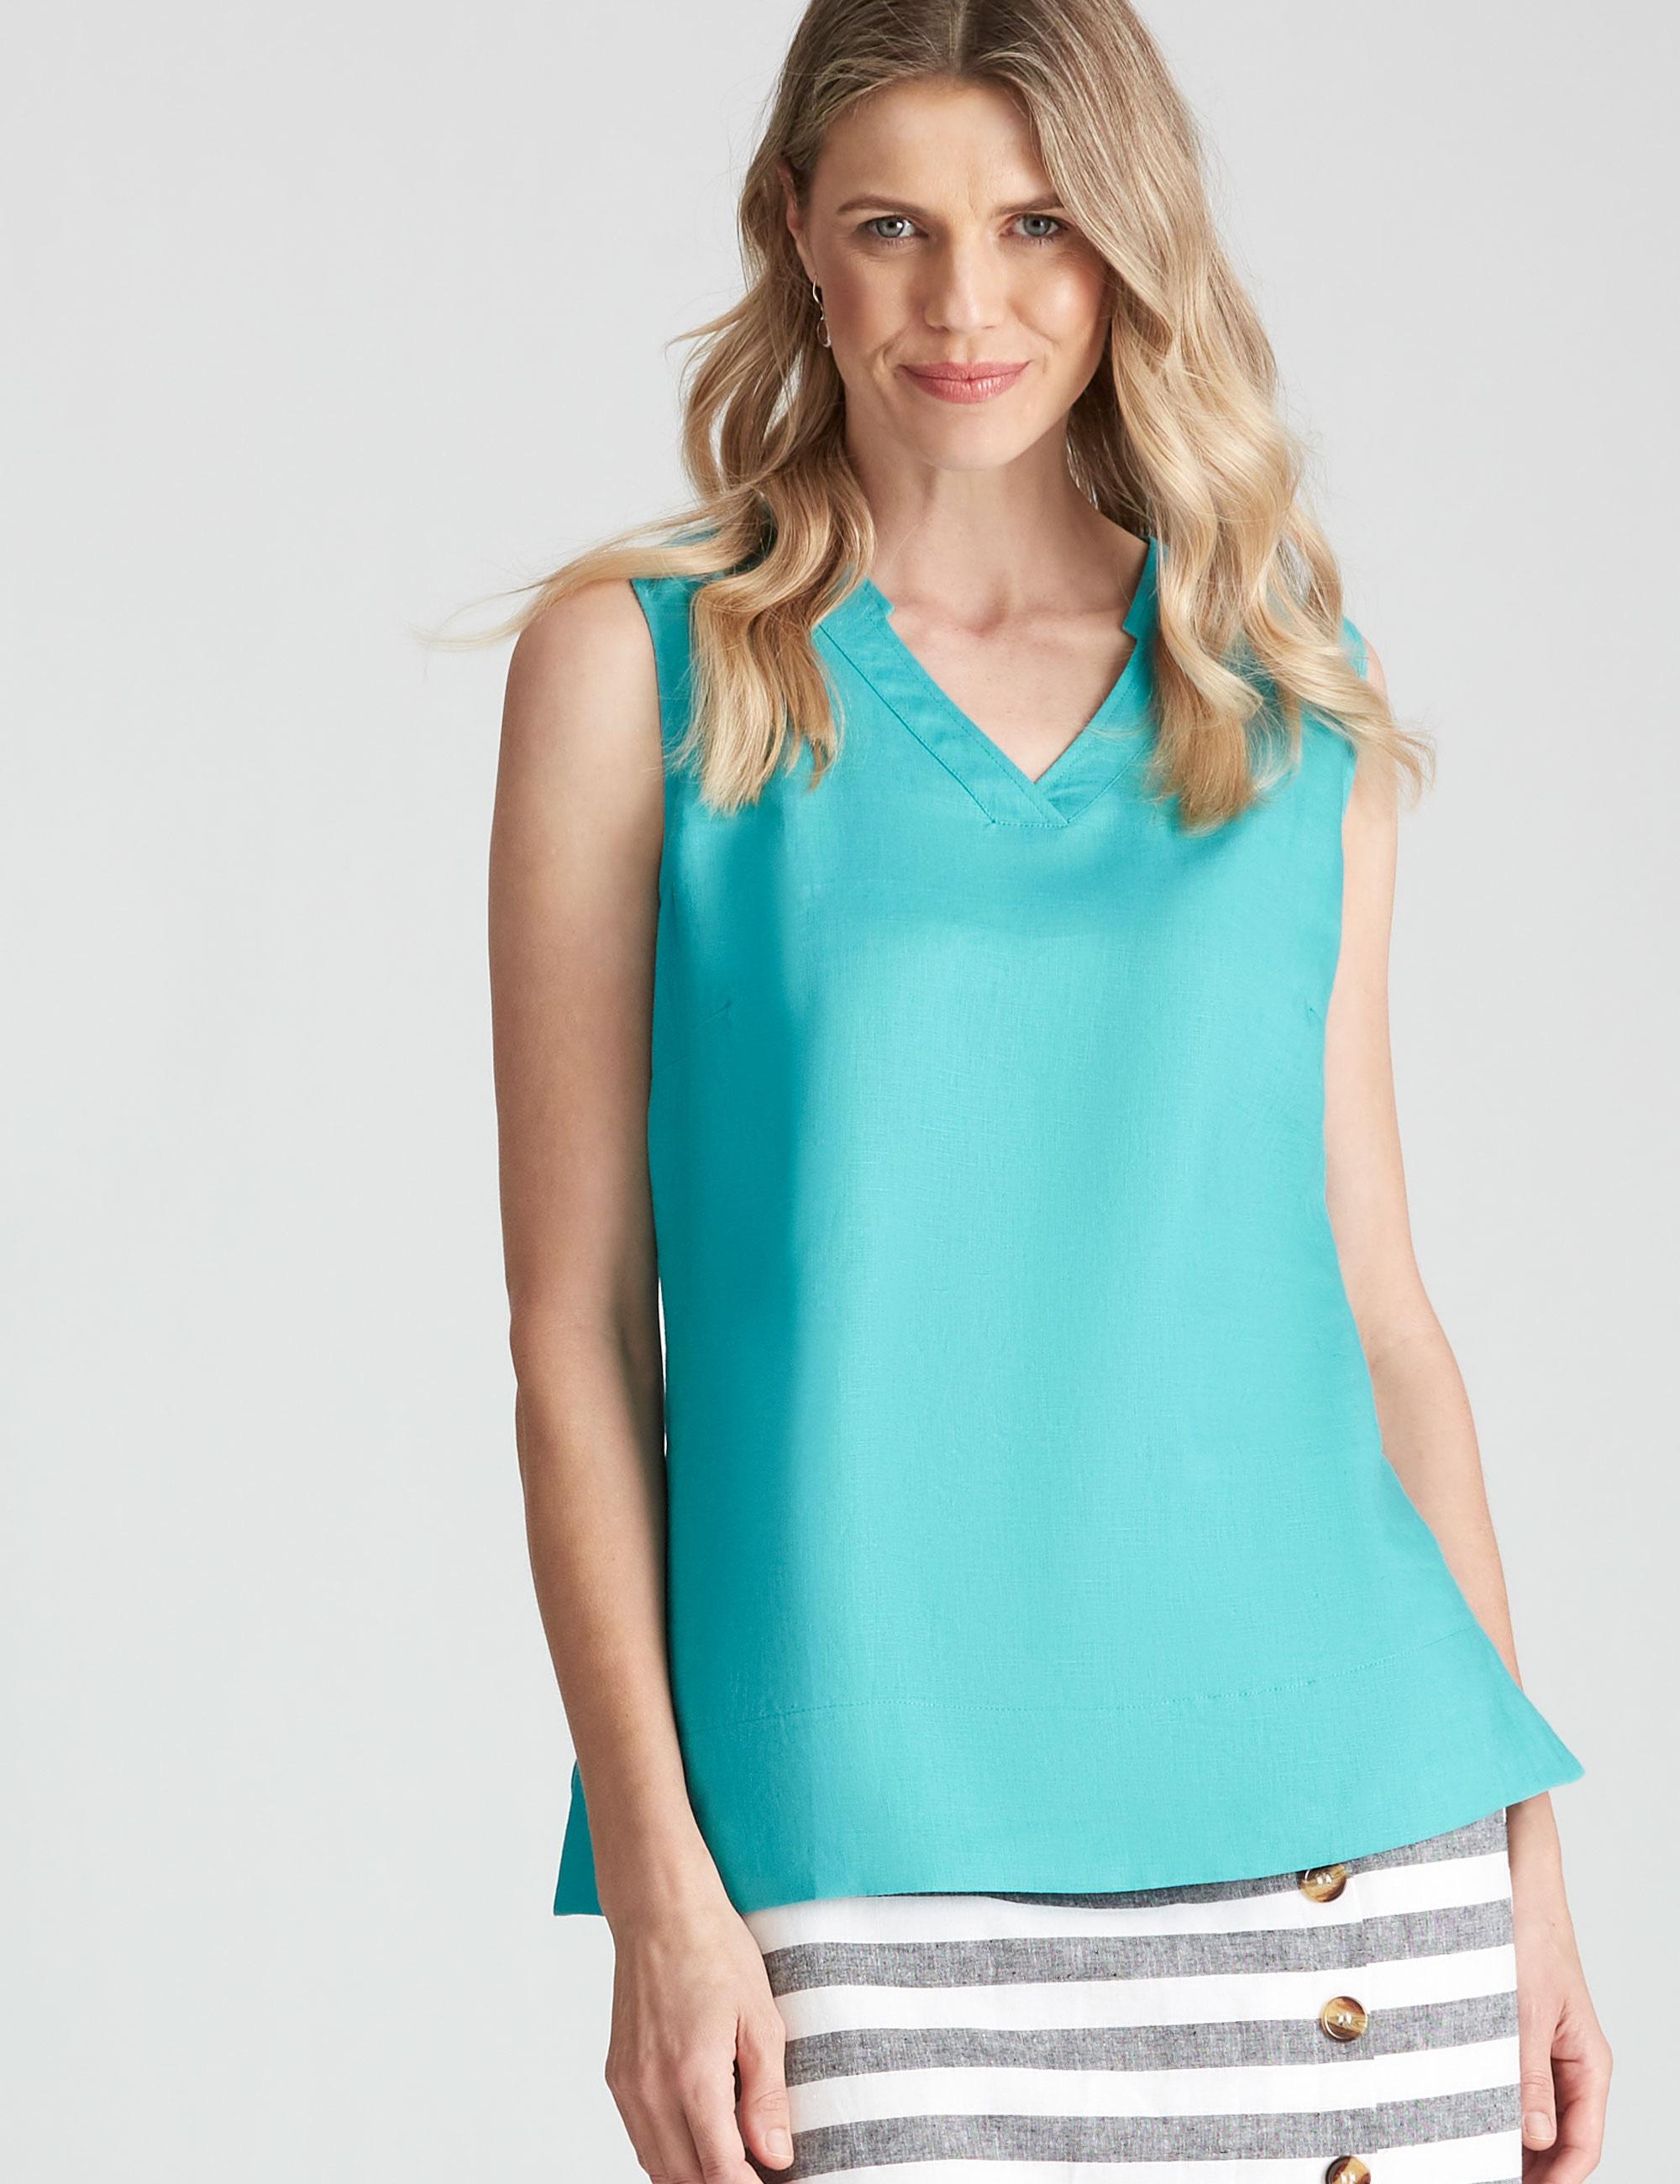 1056265430 1 - Women Fashion